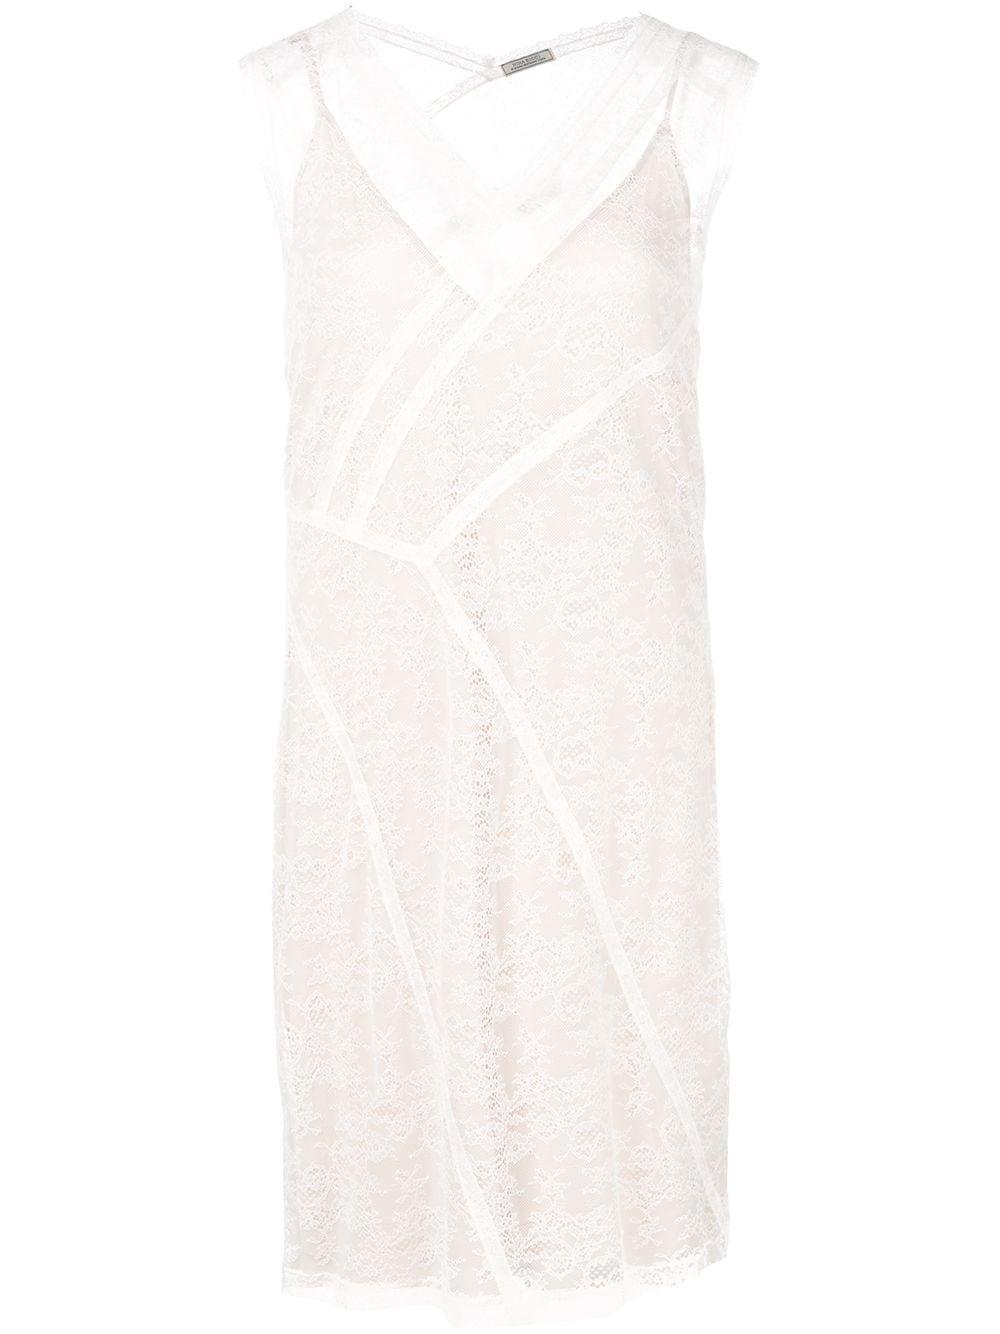 NINA RICCI   приталенное платье со вставками   Clouty